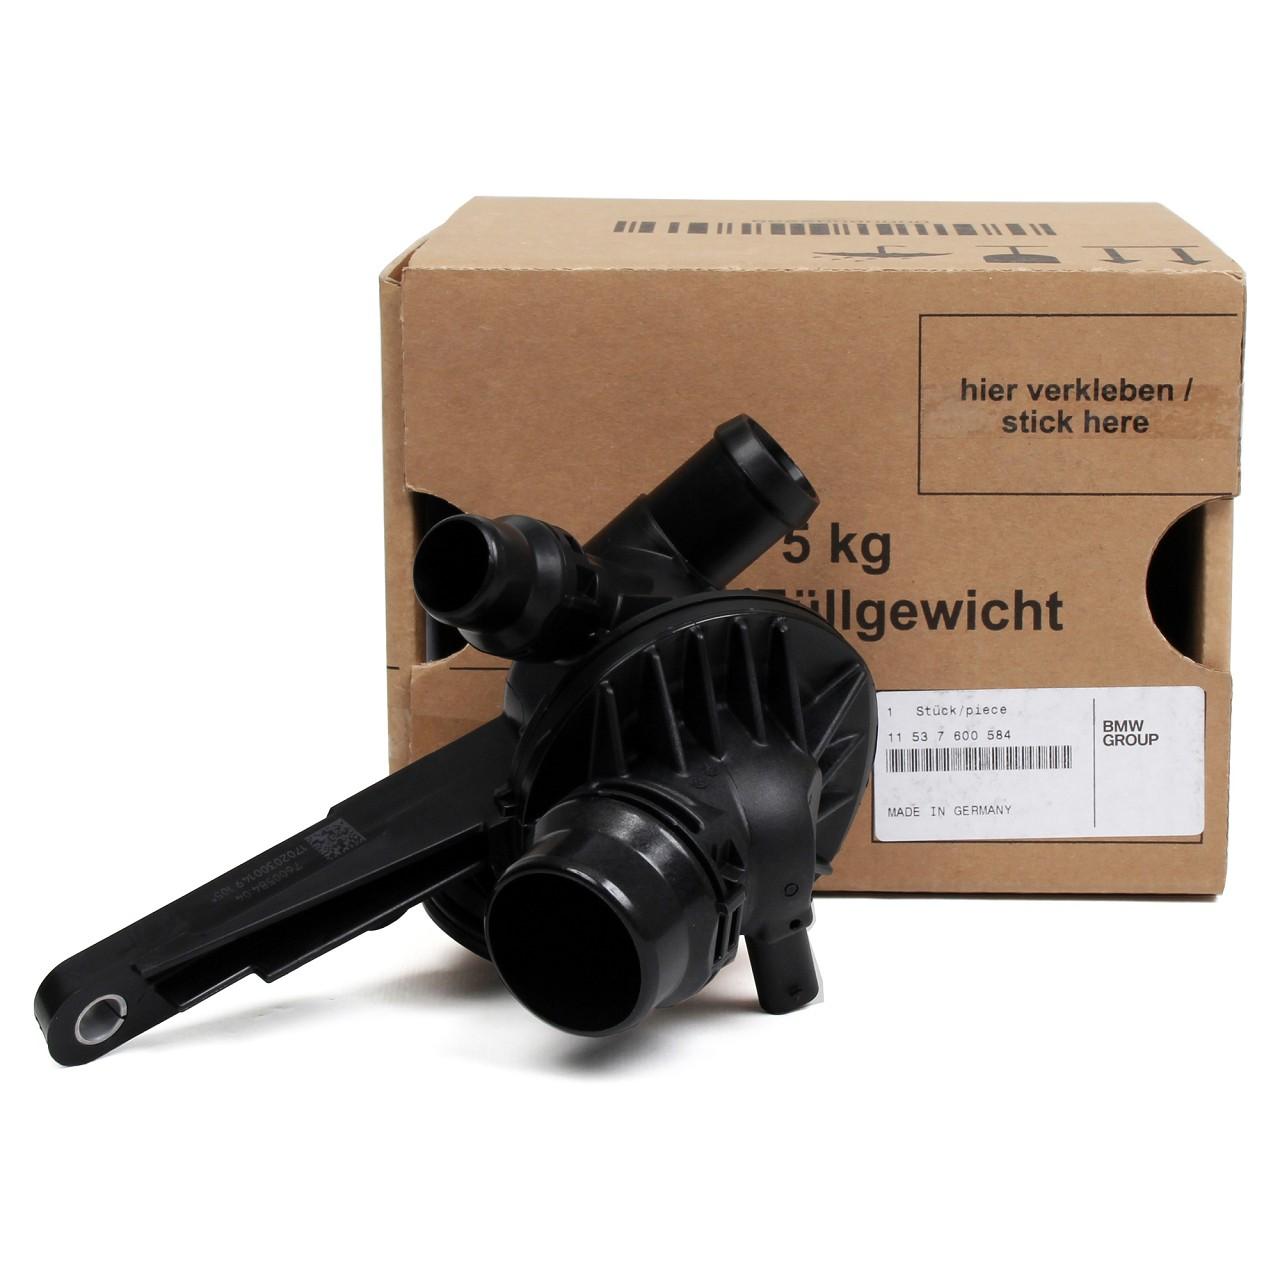 ORIGINAL BMW Thermostat + Thermostatgehäuse 11537600584 für F20 F21 F30 F31